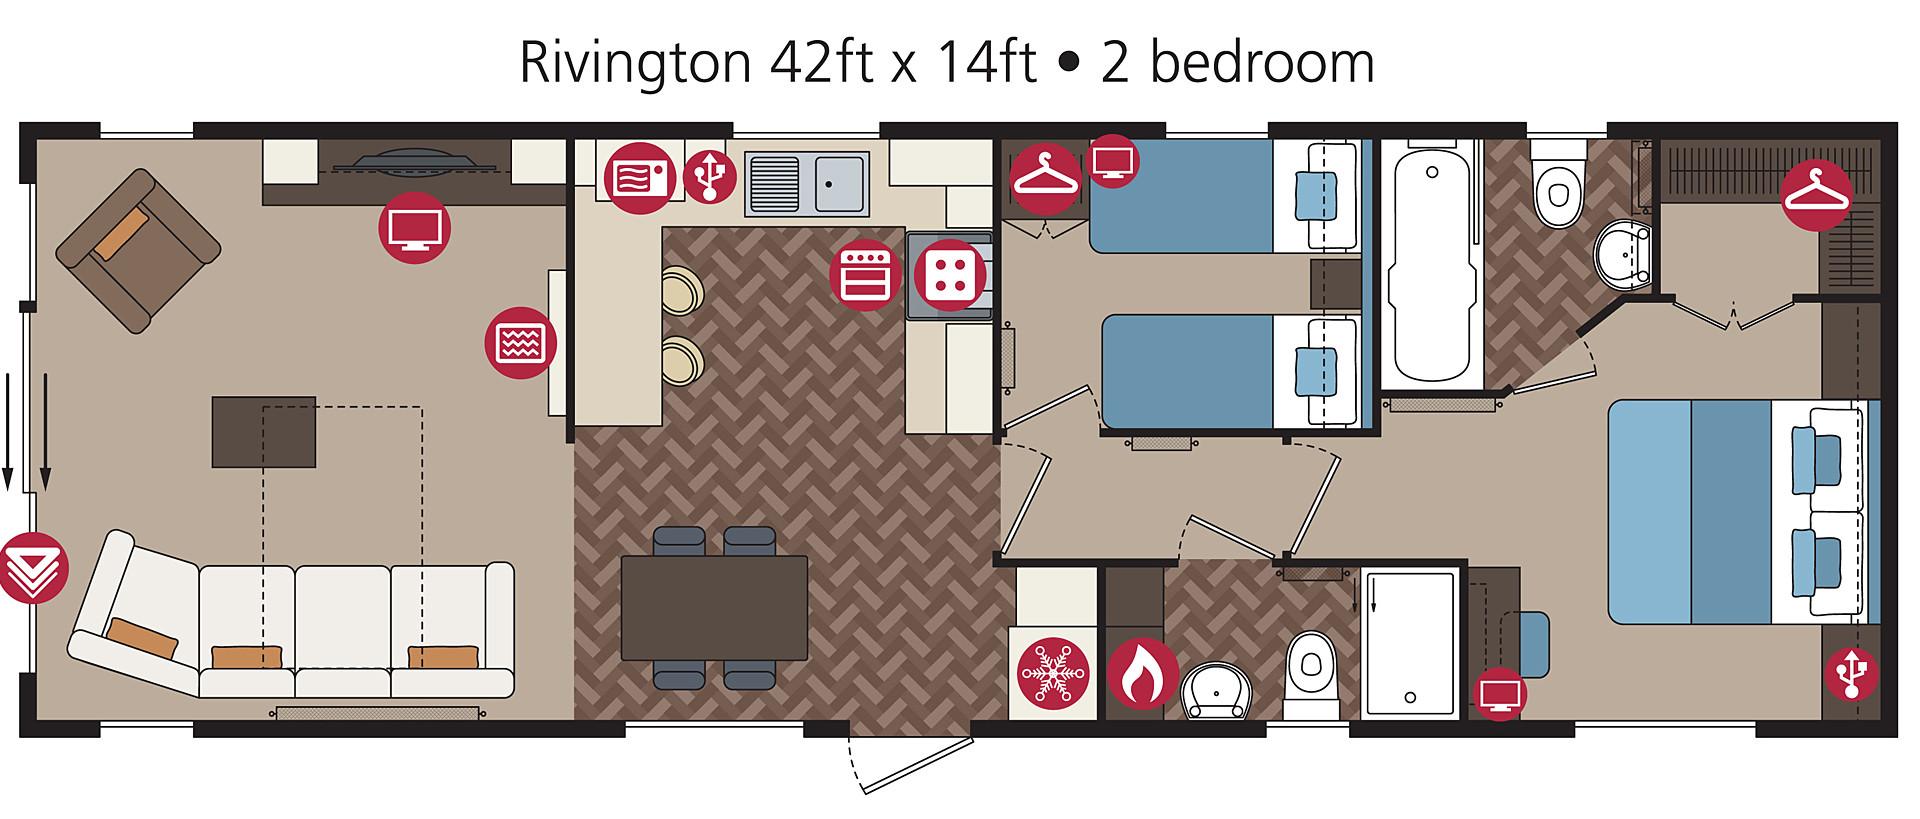 Rivington floorplan.jpg